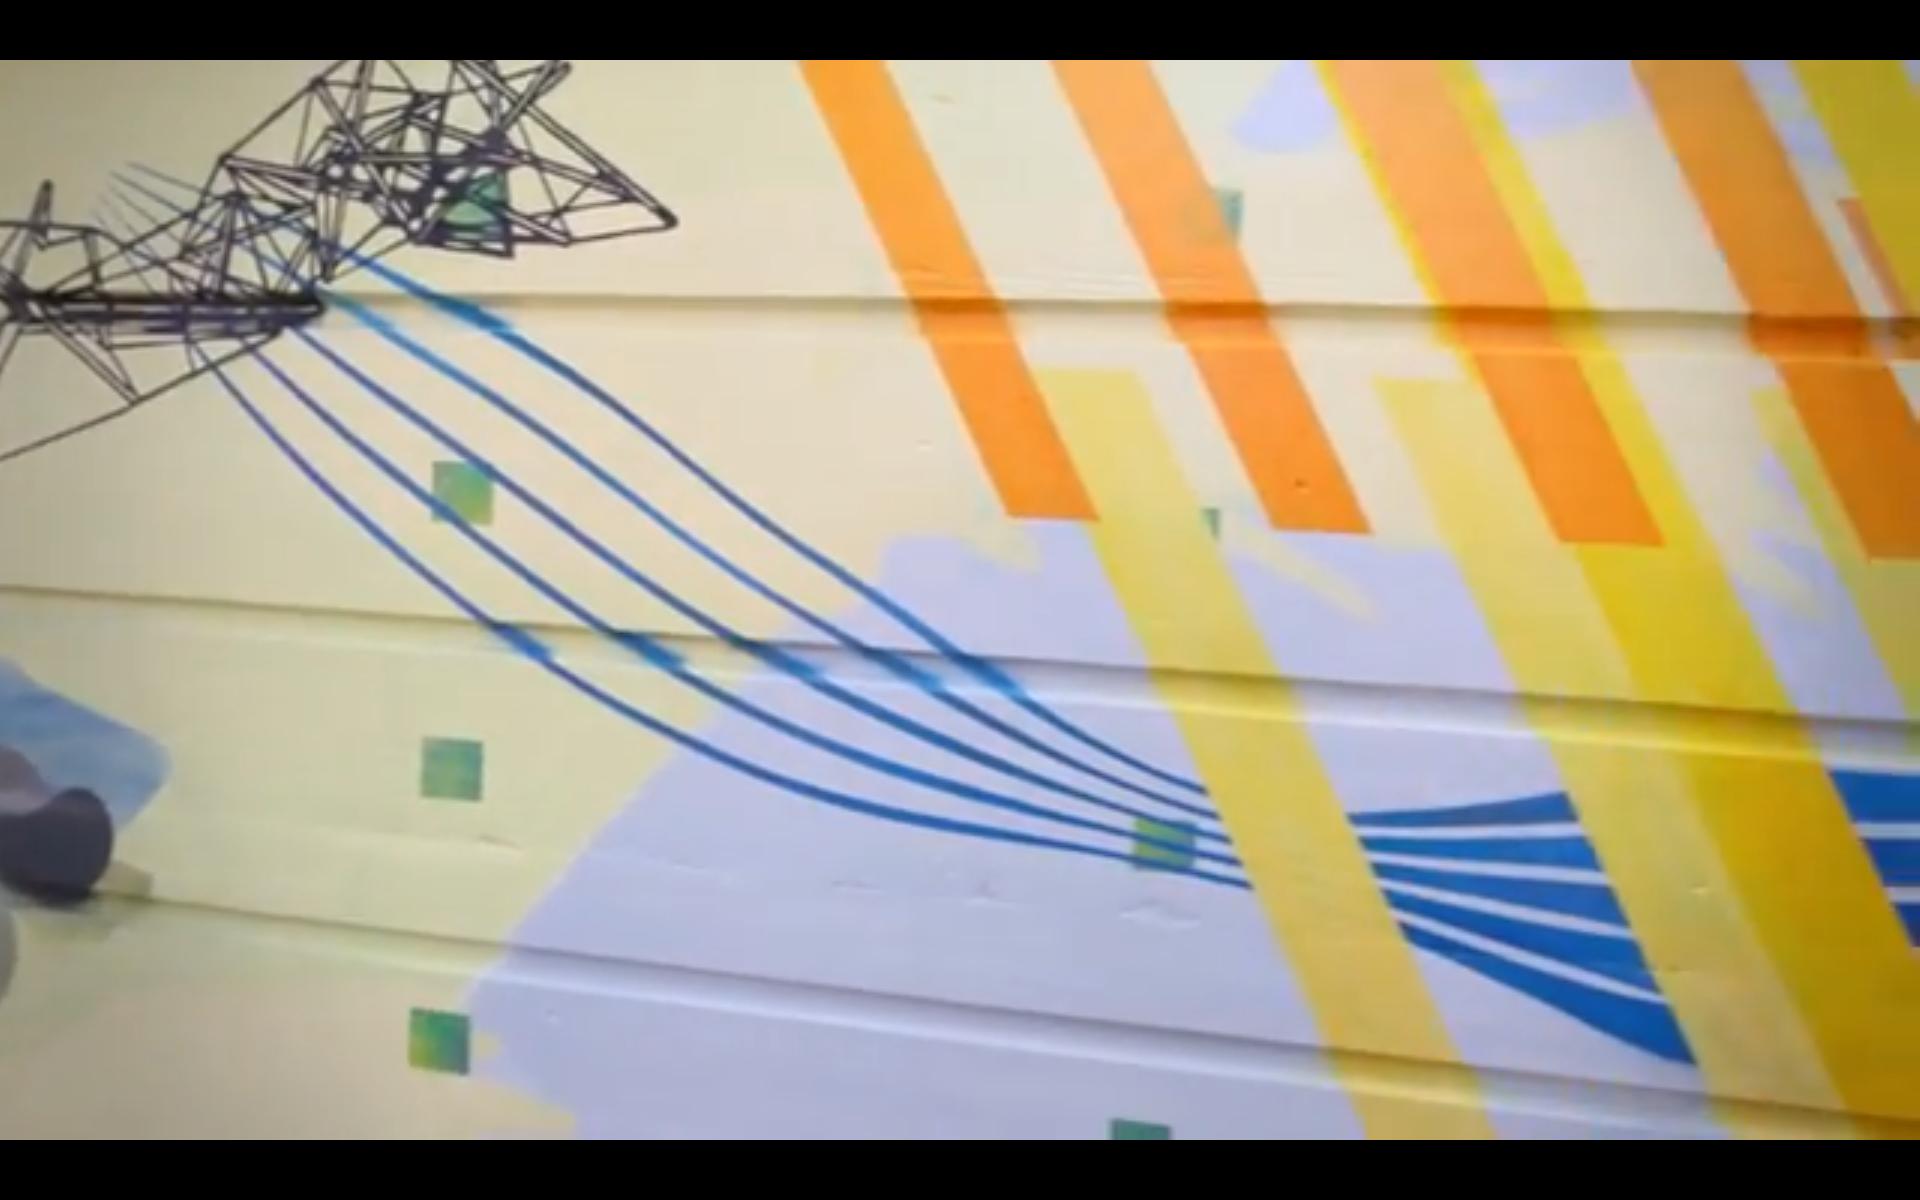 Synesthesia – Interactive Public Art, Paul Aloisi, 2014